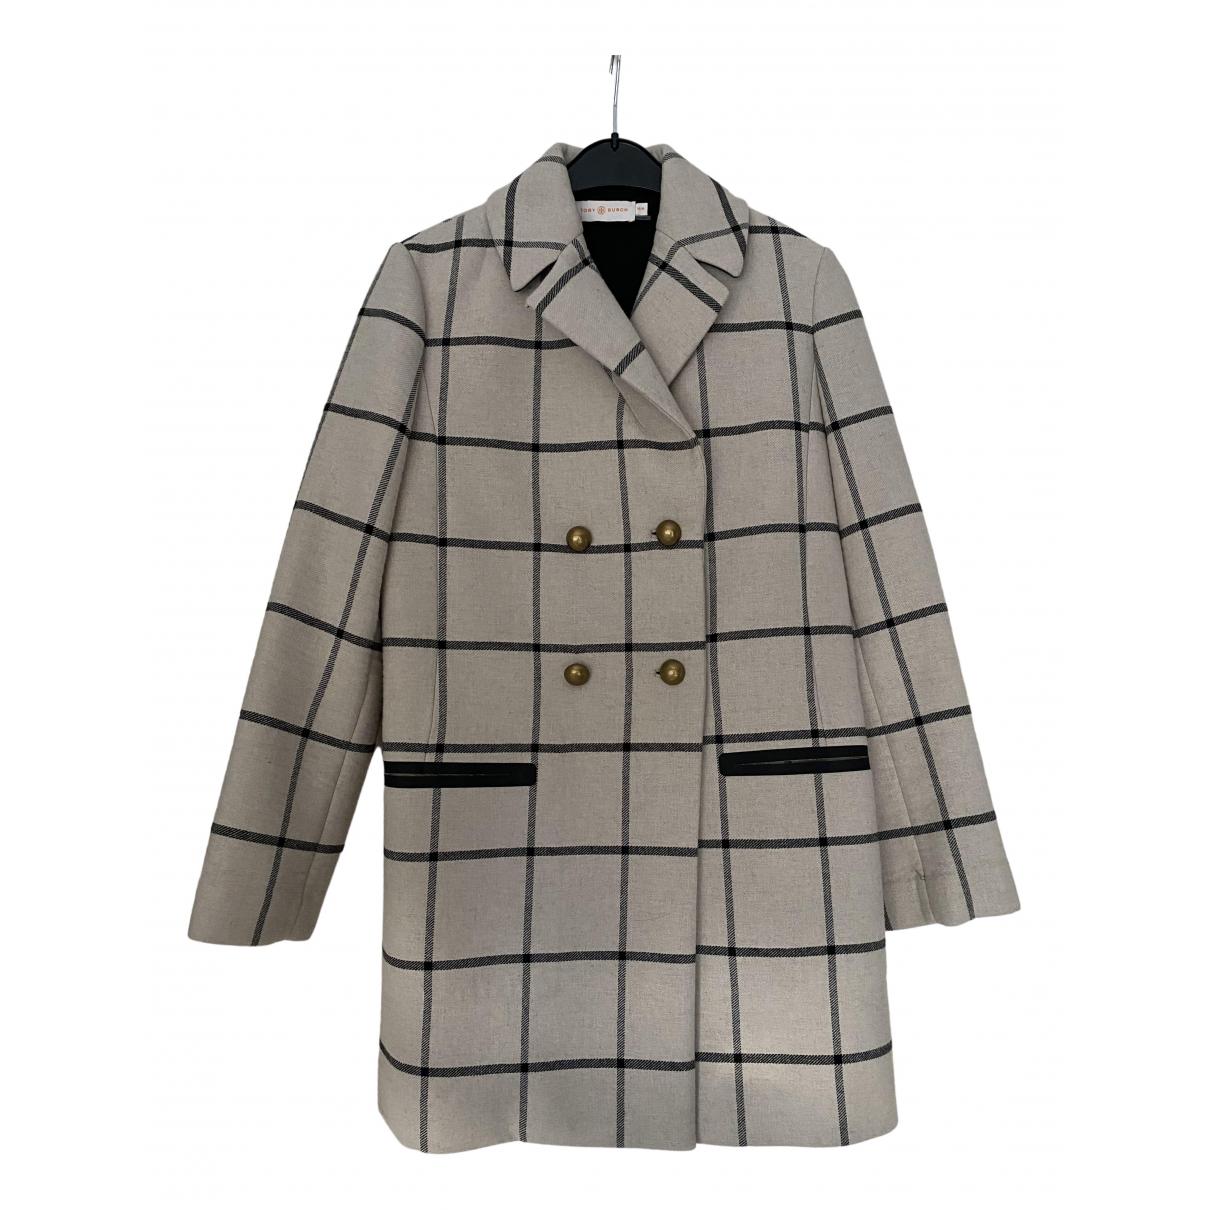 Tory Burch N Ecru coat for Women M International